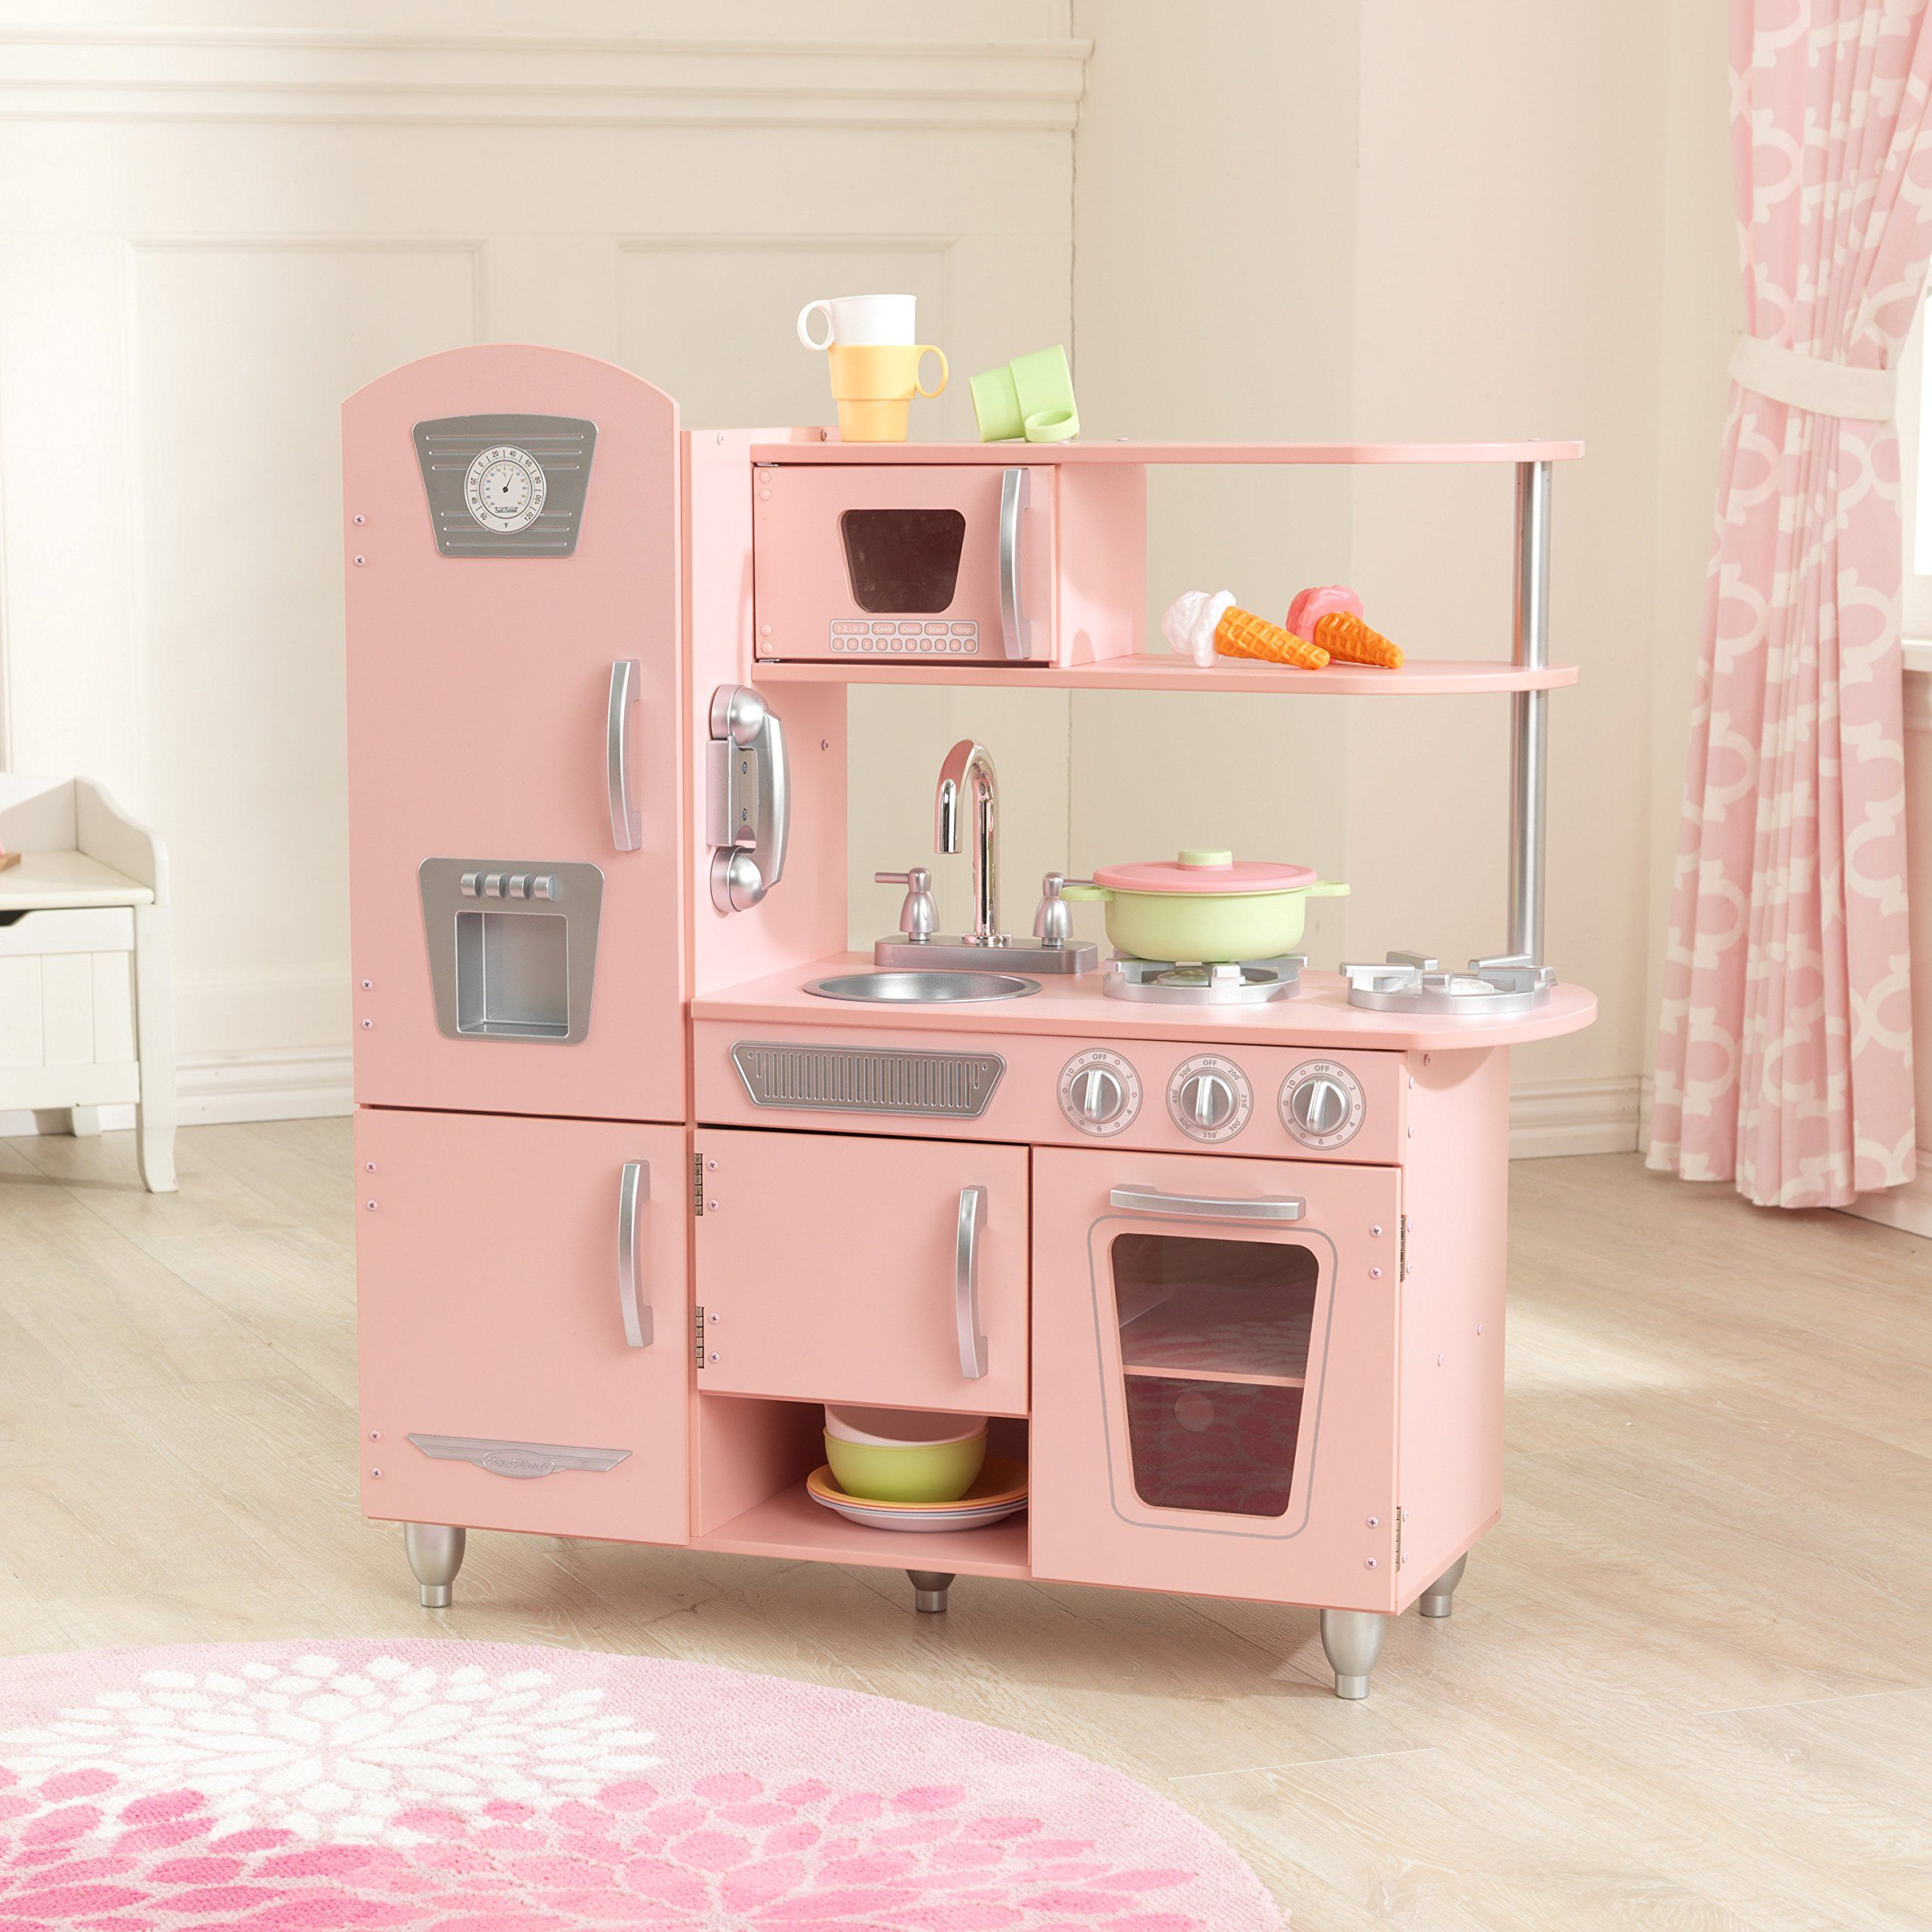 Kidkraft Vintage Kitchen in Pink * Details can be found by